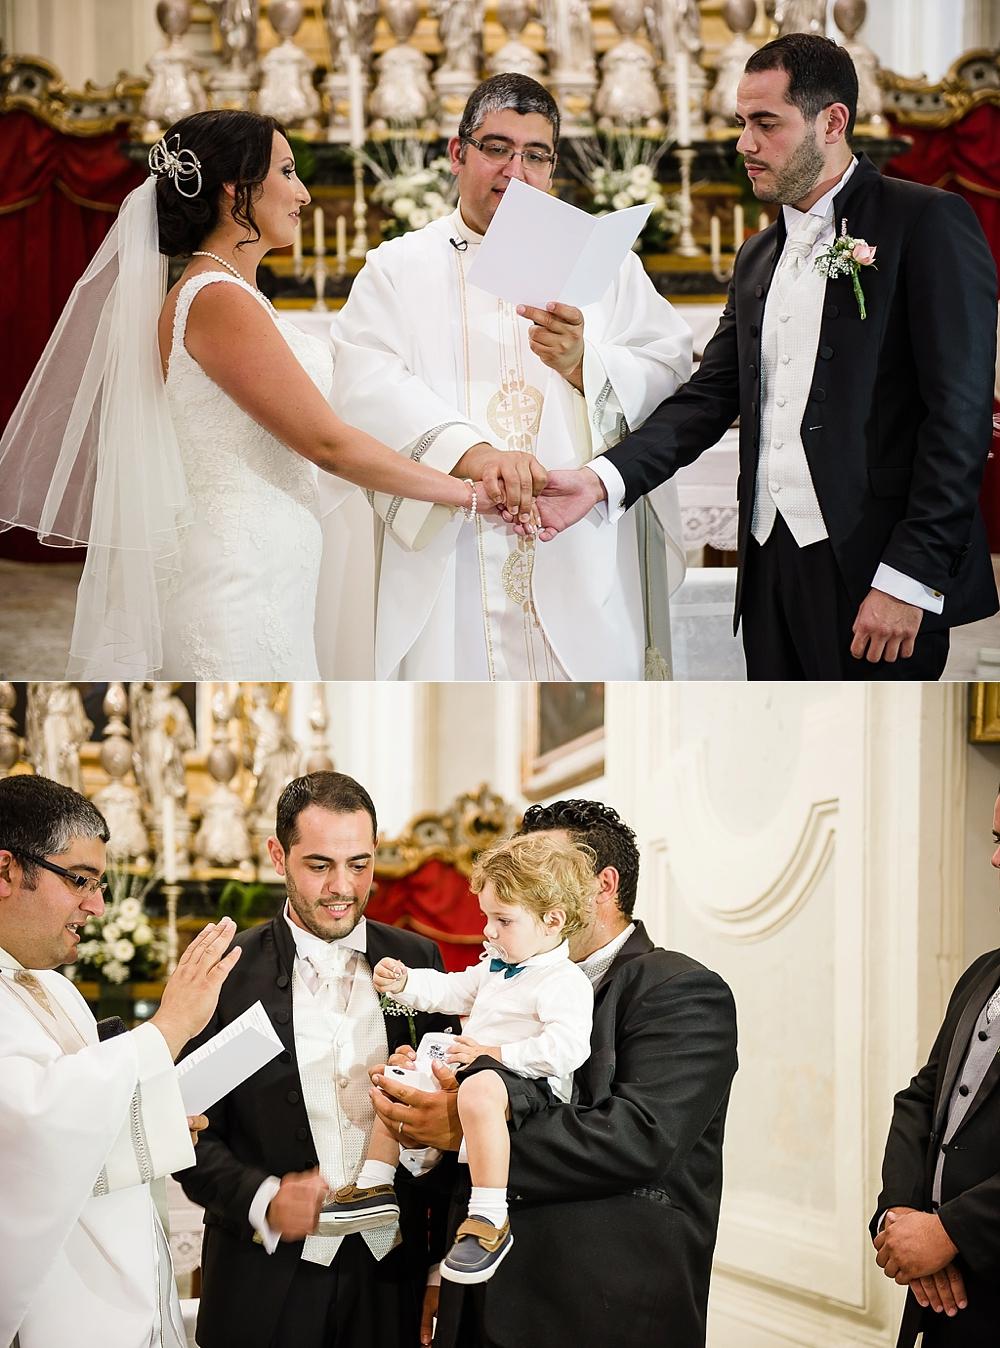 Saluting Battery - Wedding - Shane P. Watts Photography